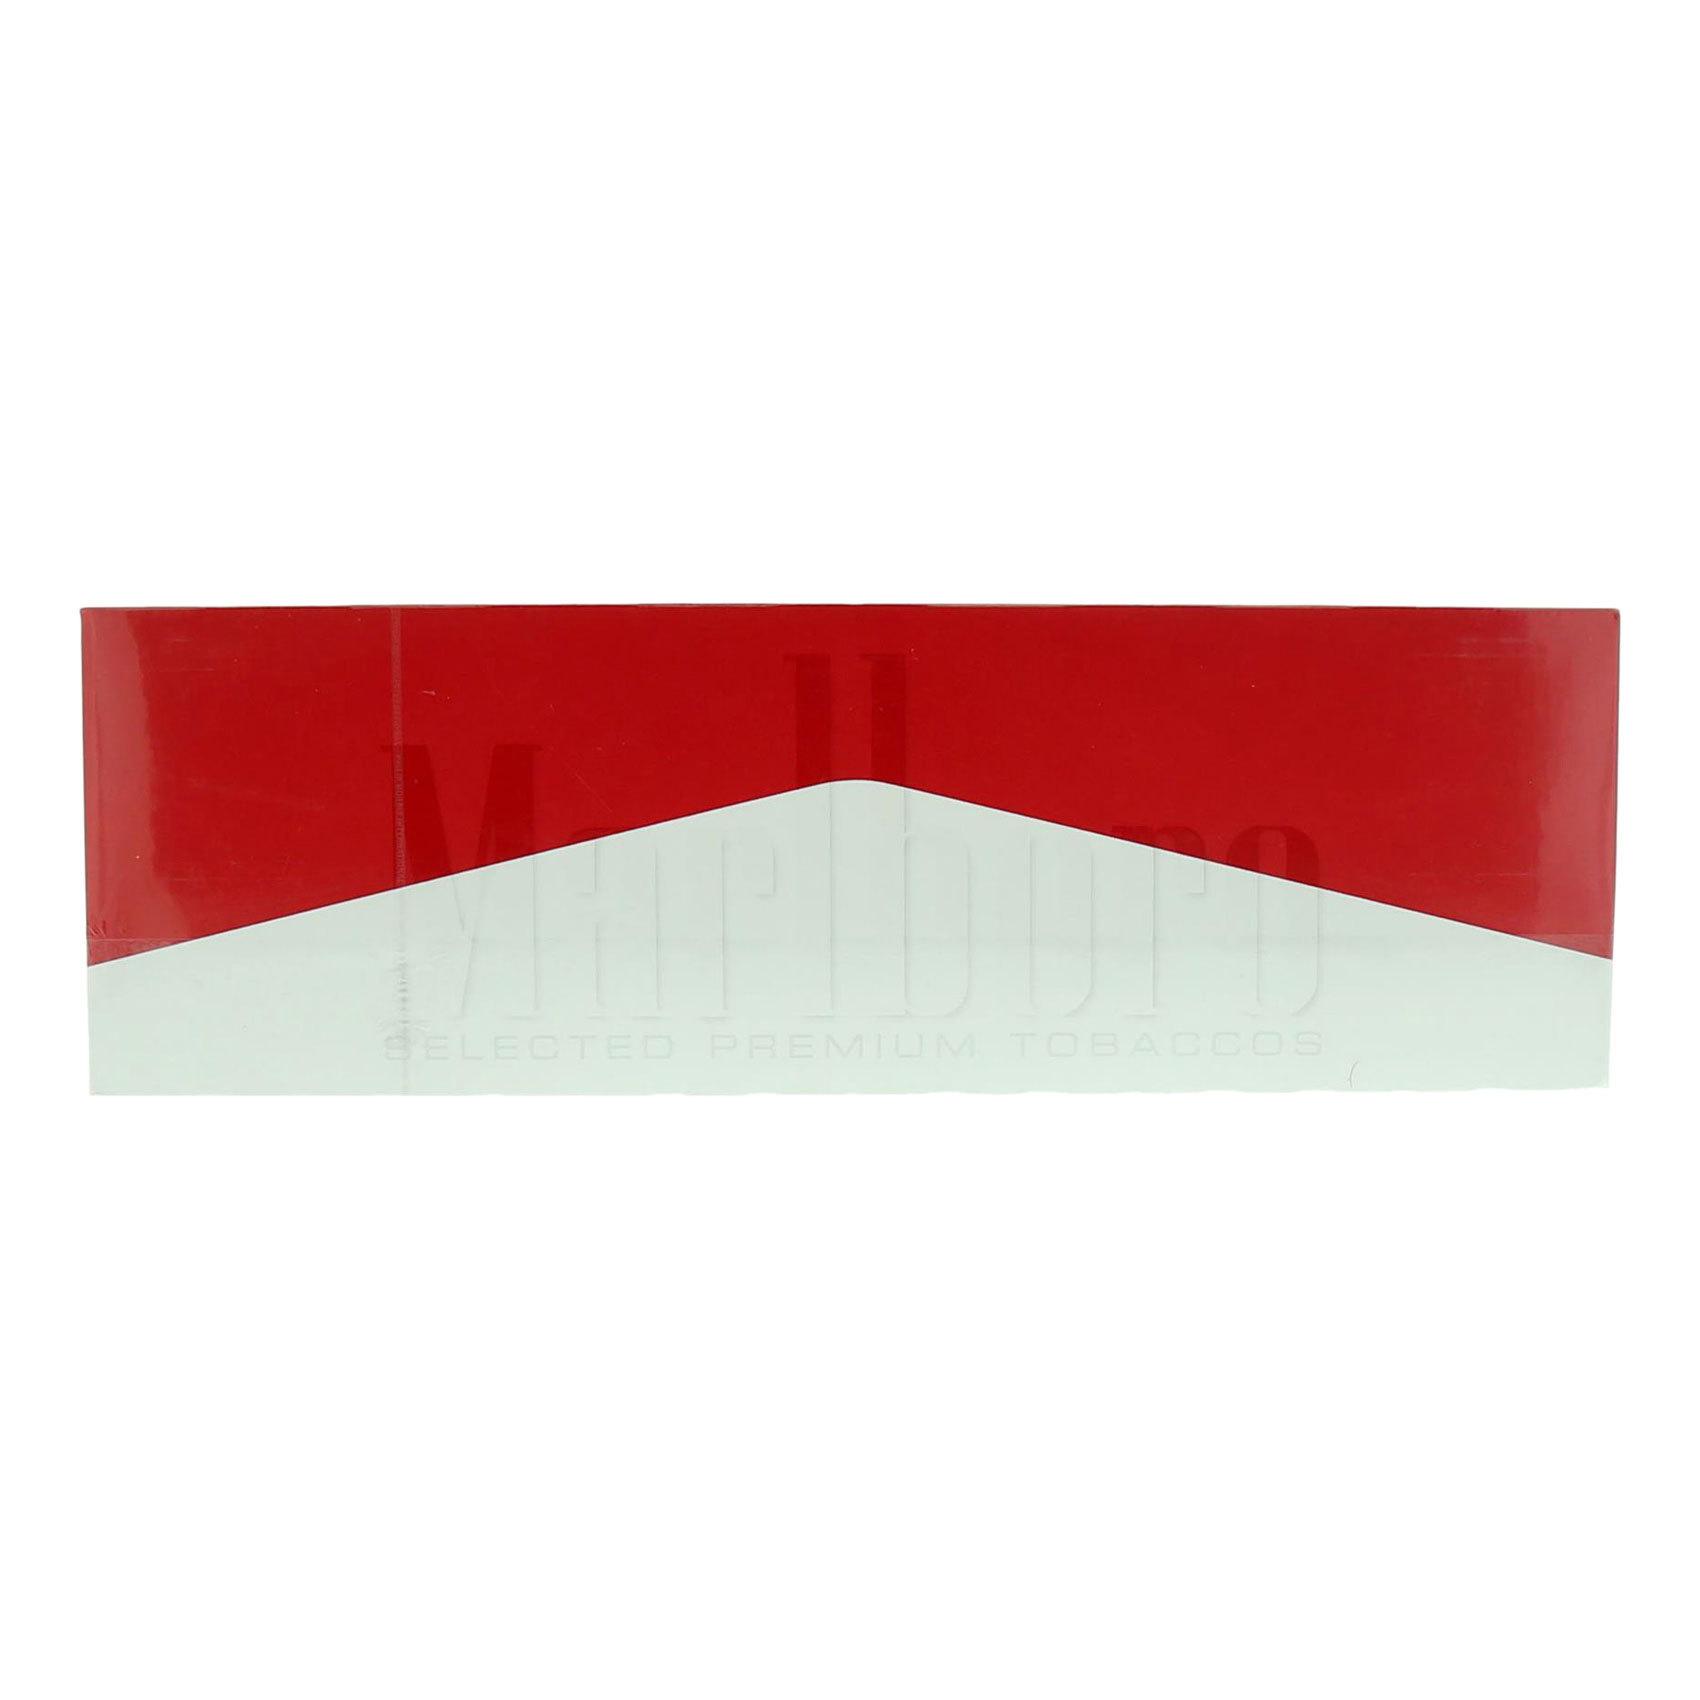 MARLBORO RED KS BOX 20X10 OUTER